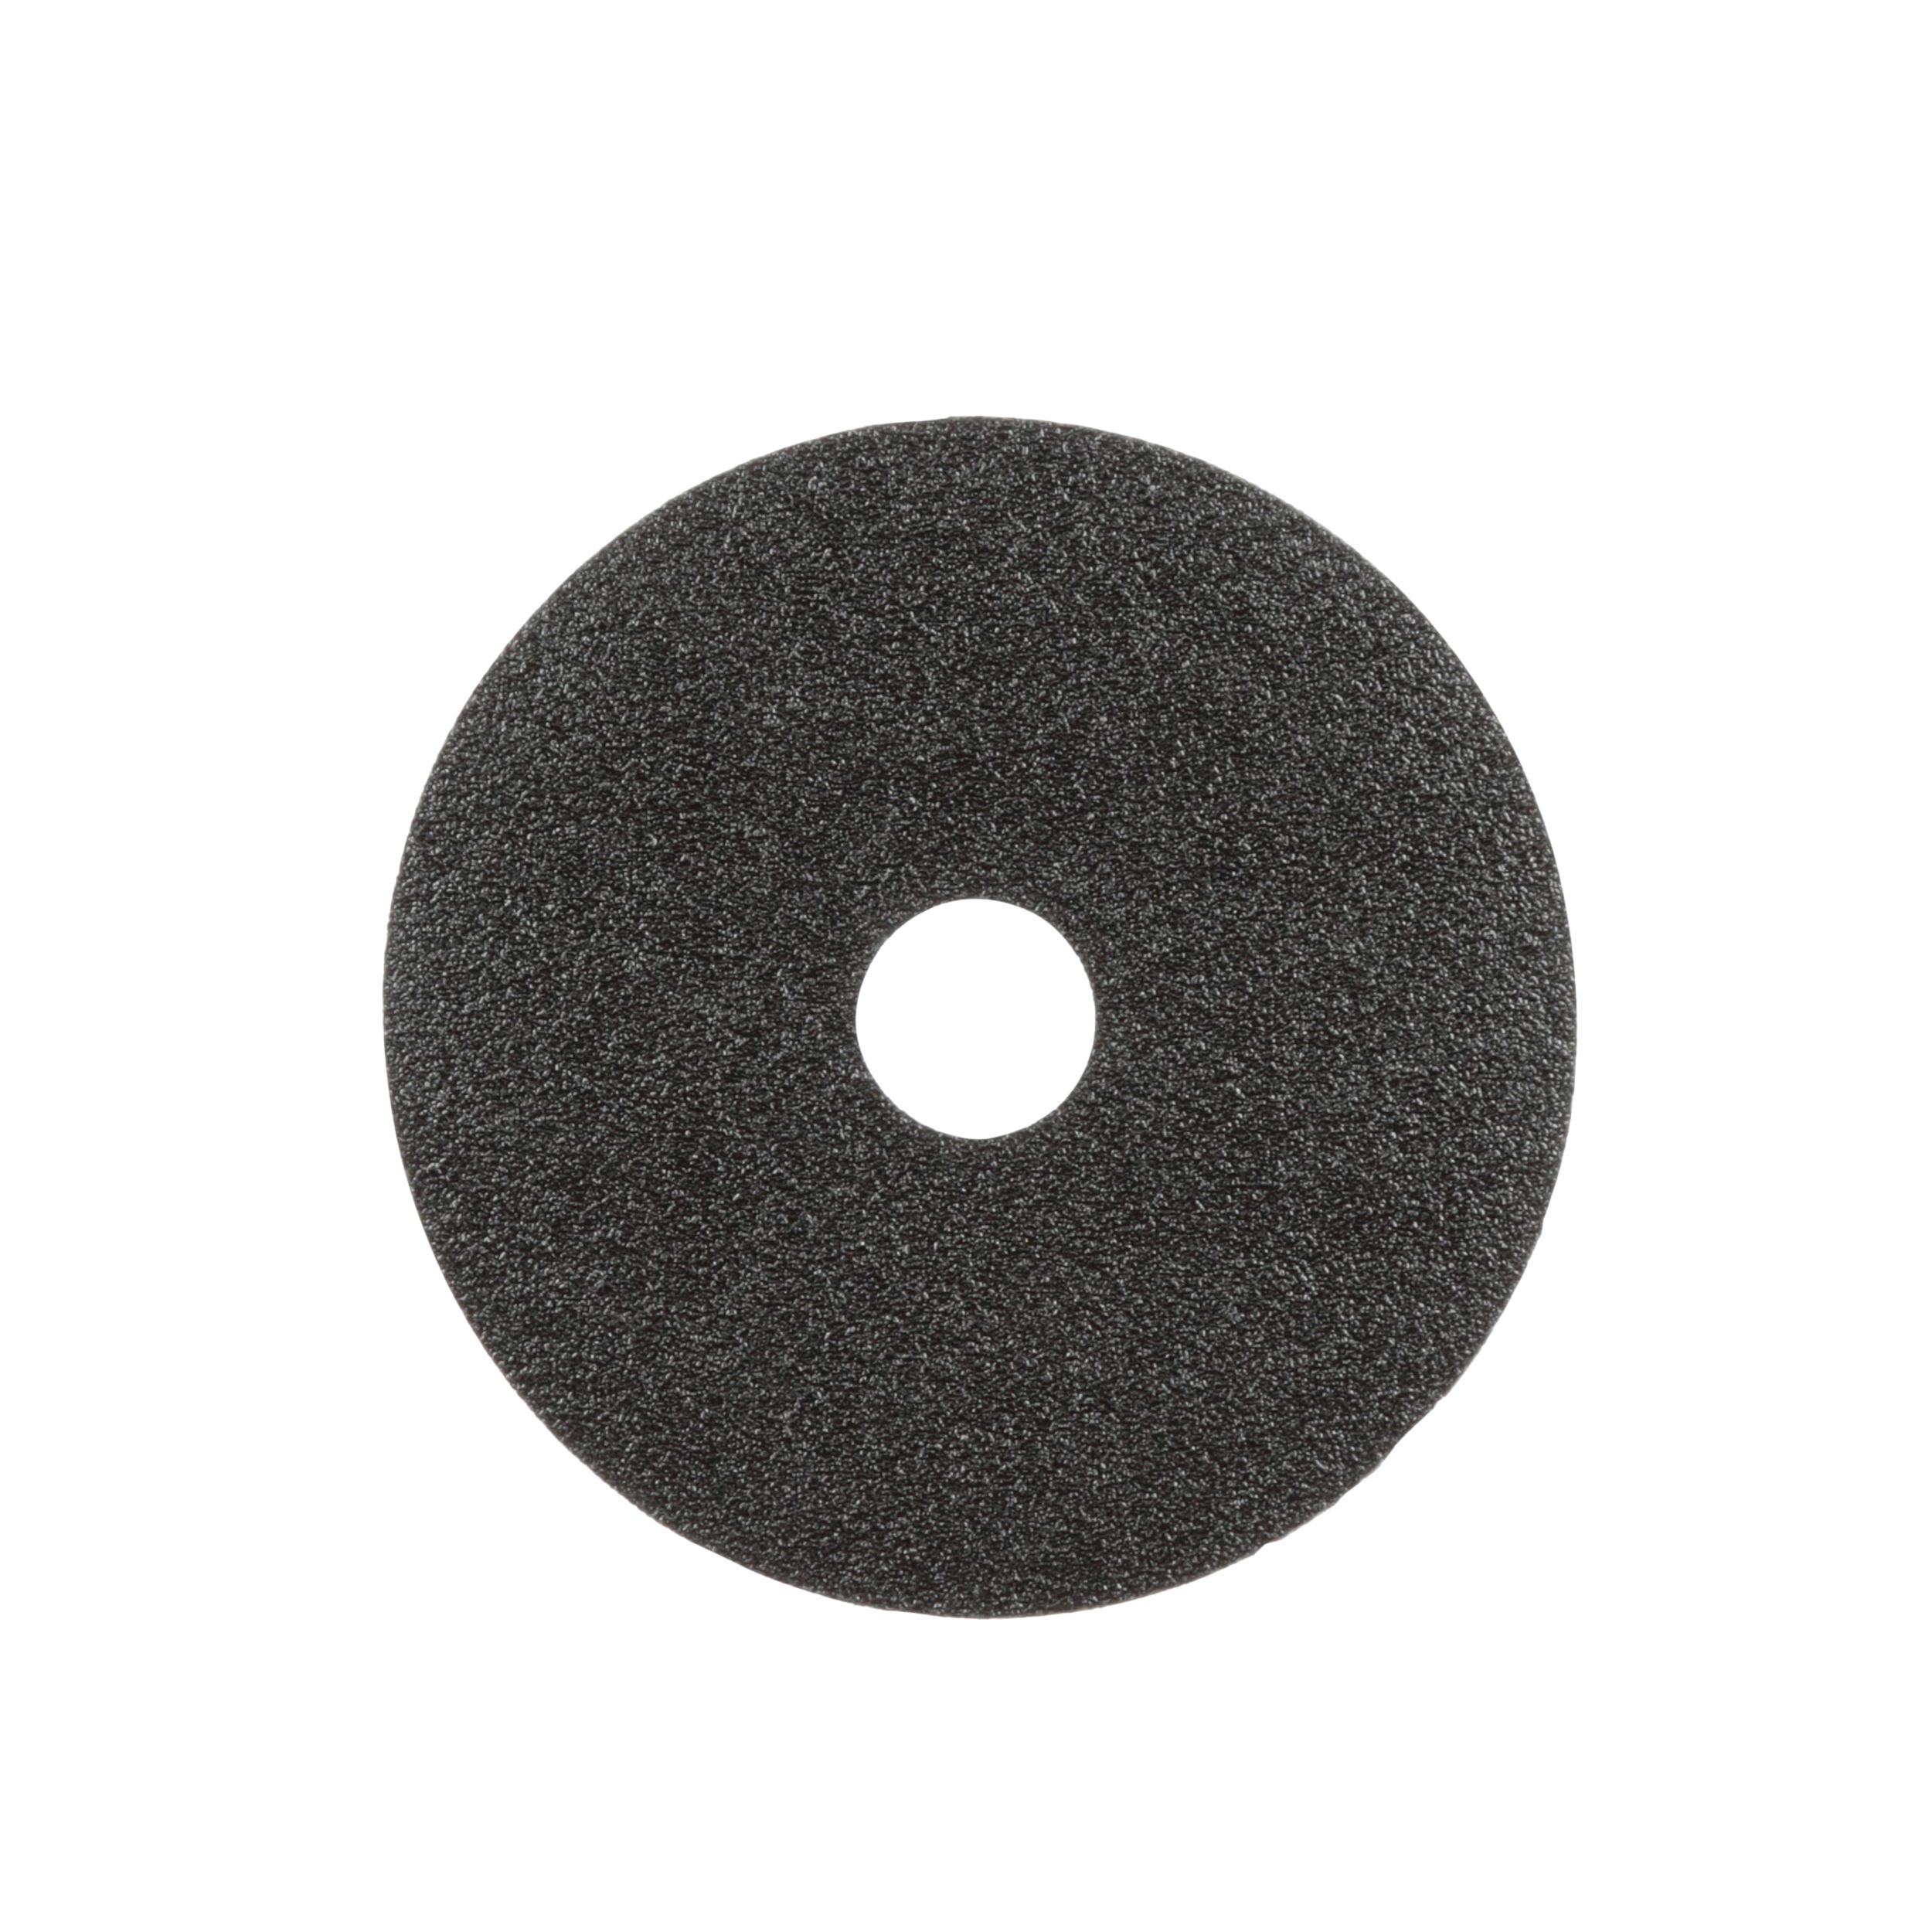 3M™ 051111-50416 501C Close Coated Closed Coated Abrasive Disc, 4-1/2 in Dia Disc, 7/8 in Center Hole, 80 Grit, Medium Grade, Zirconia Alumina Abrasive, Arbor Attachment